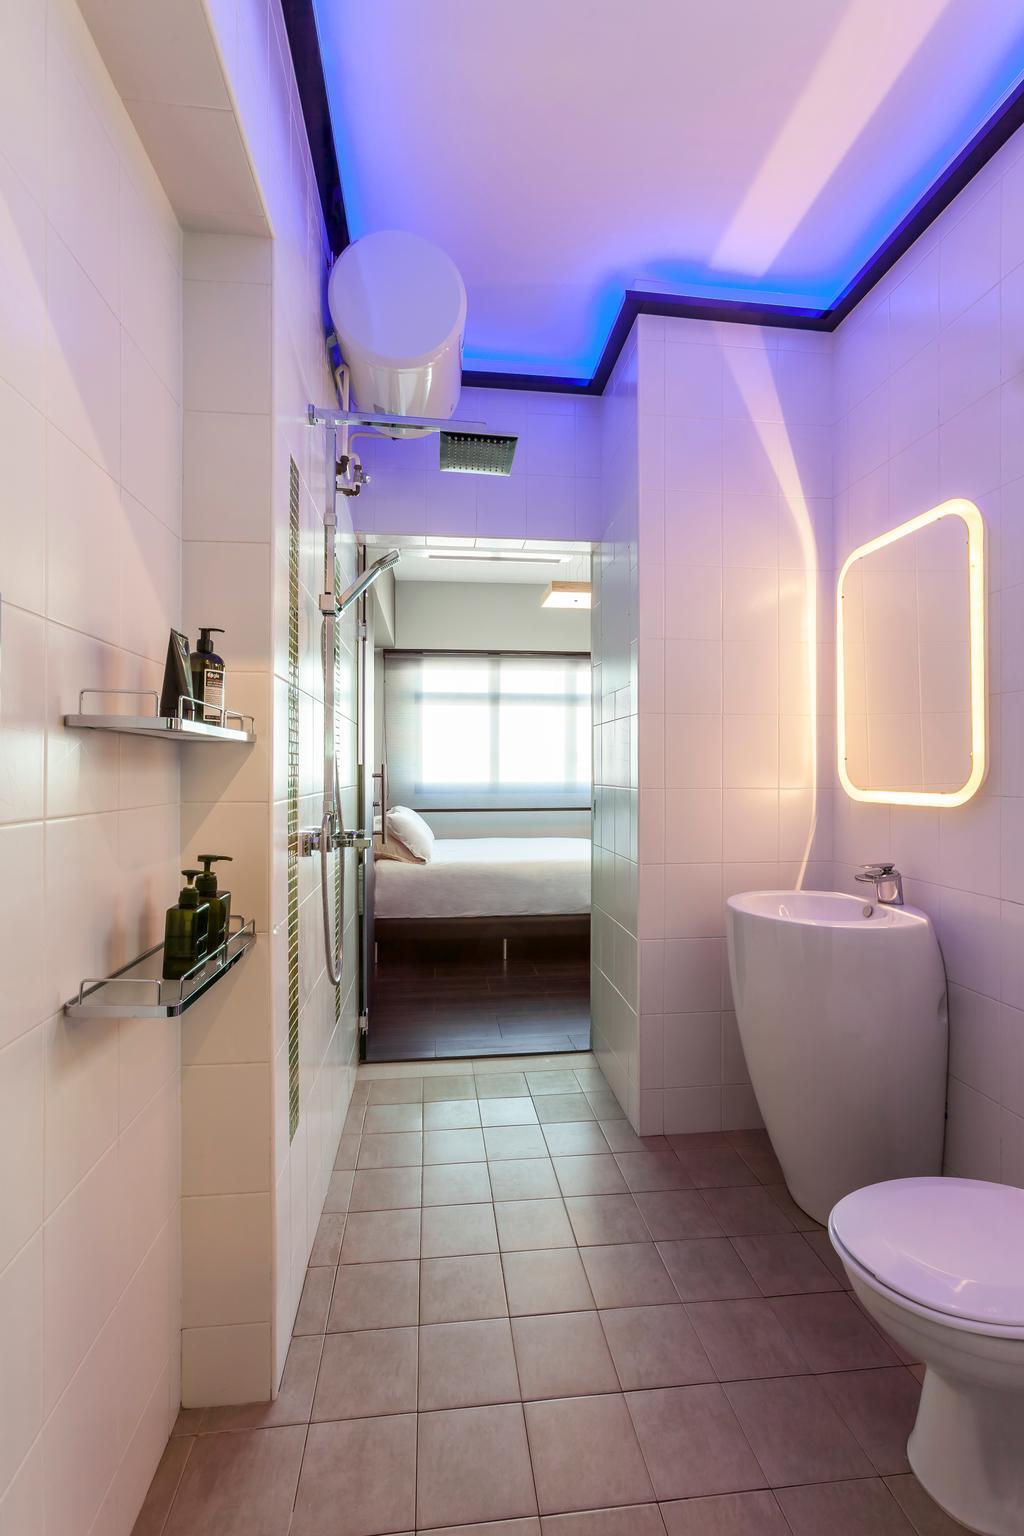 Transitional, HDB, Bathroom, Boon Lay Meadow (Block 181B), Interior Designer, Absolook Interior Design, Hidden Interior Lighting, Blue Neon Lights, Ceramic Tiles, Wall Mounted Ledge, Toilet, Toilet Basin, Indoors, Interior Design, Room